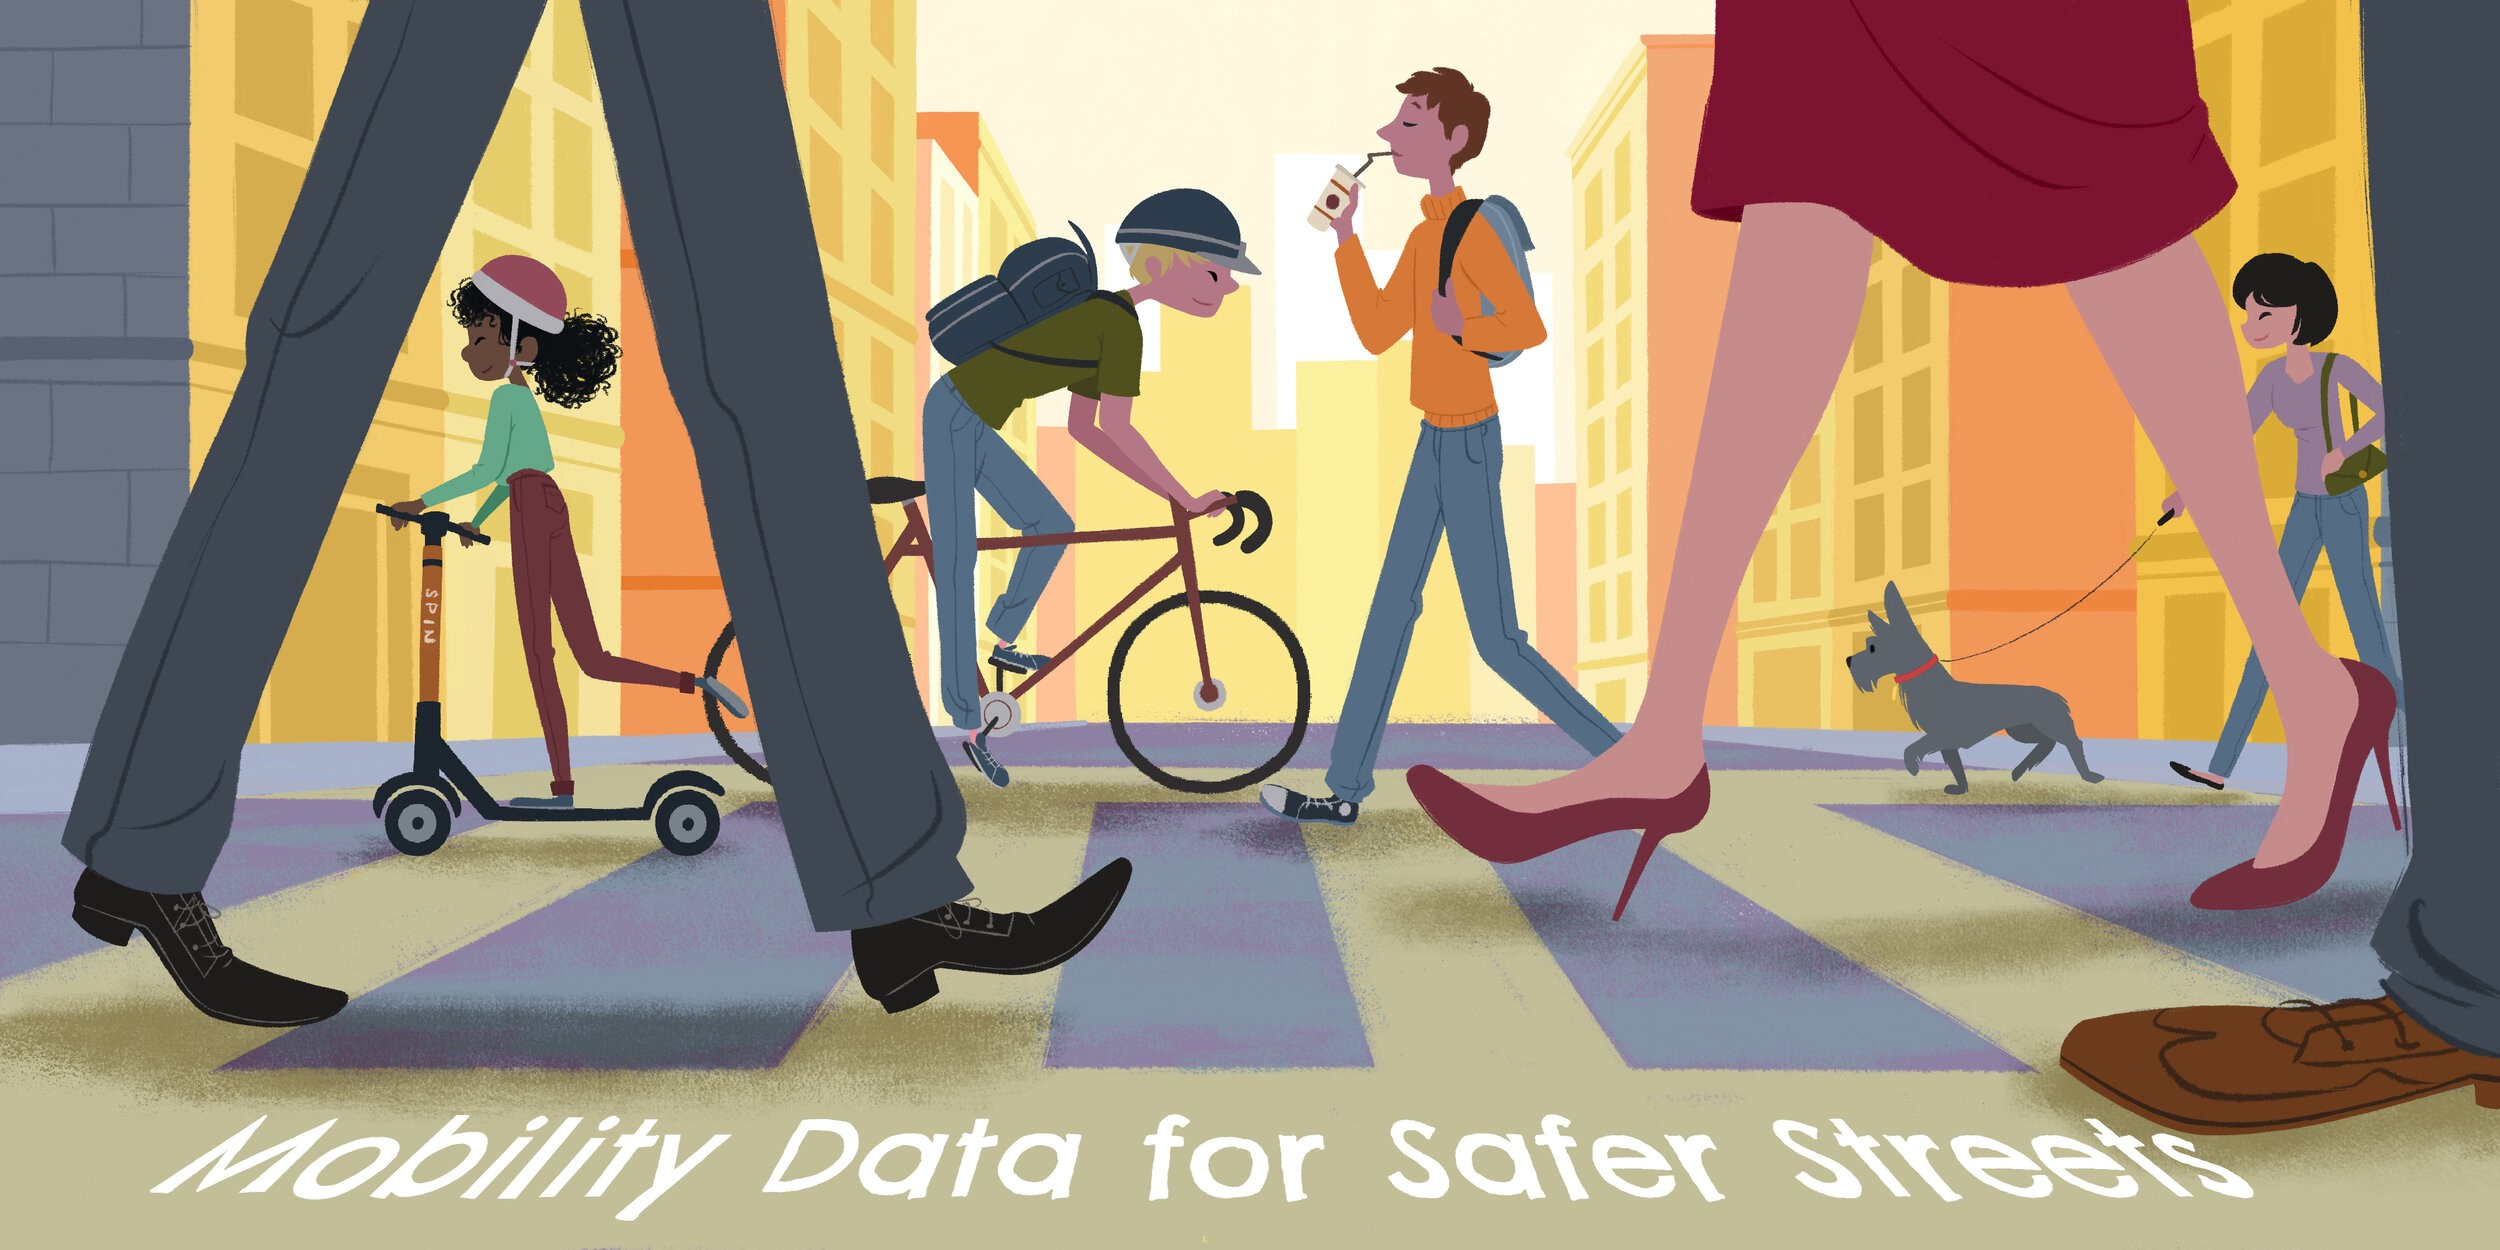 Mobility Data for Safer Streets Illustration